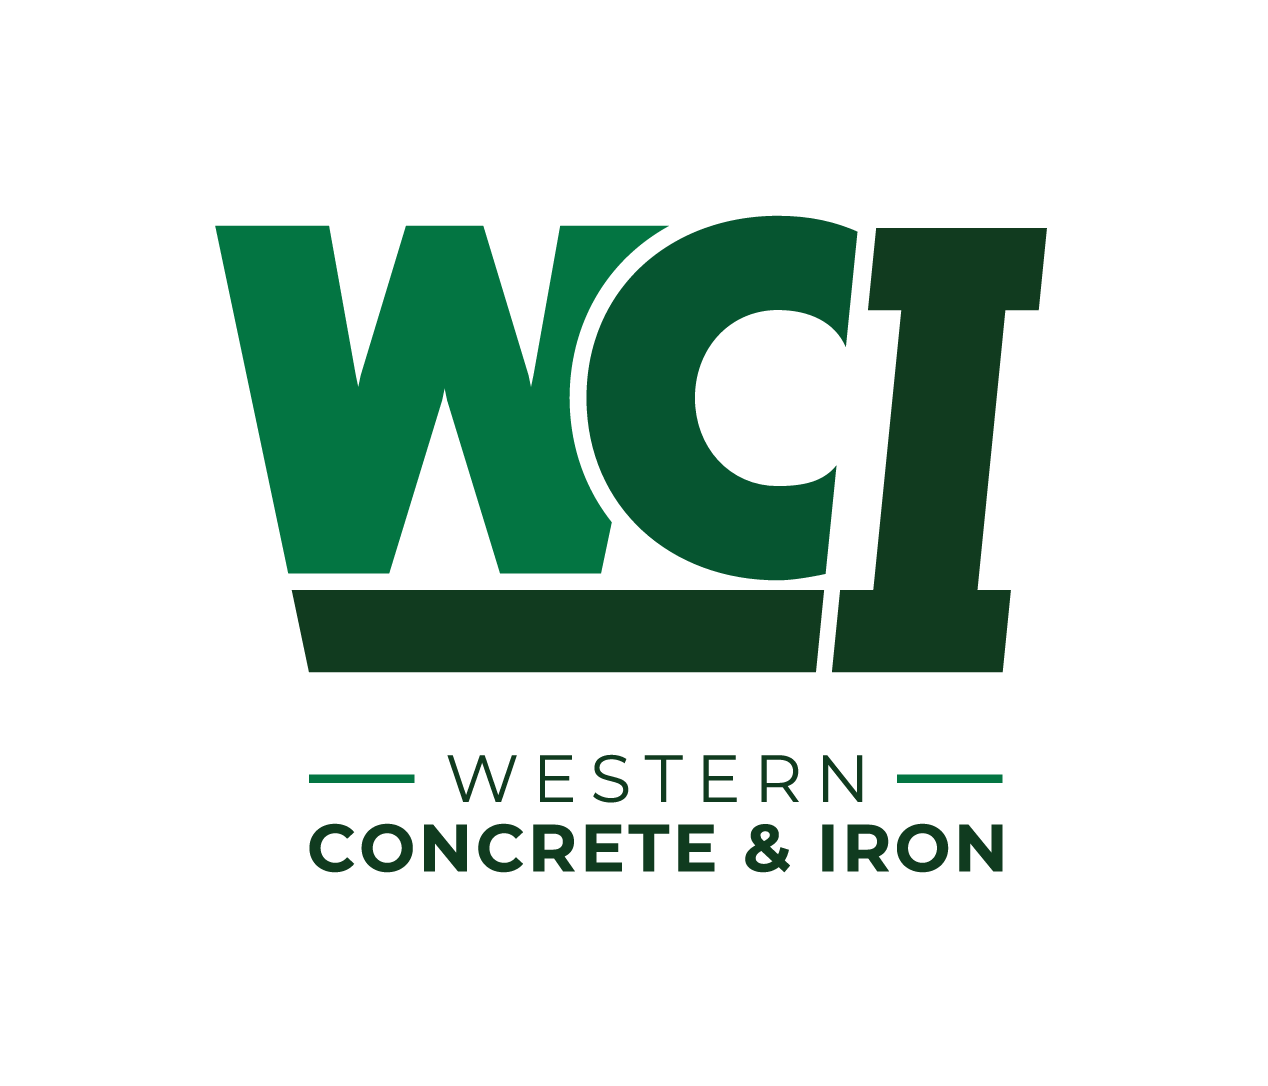 Western Concrete & Iron